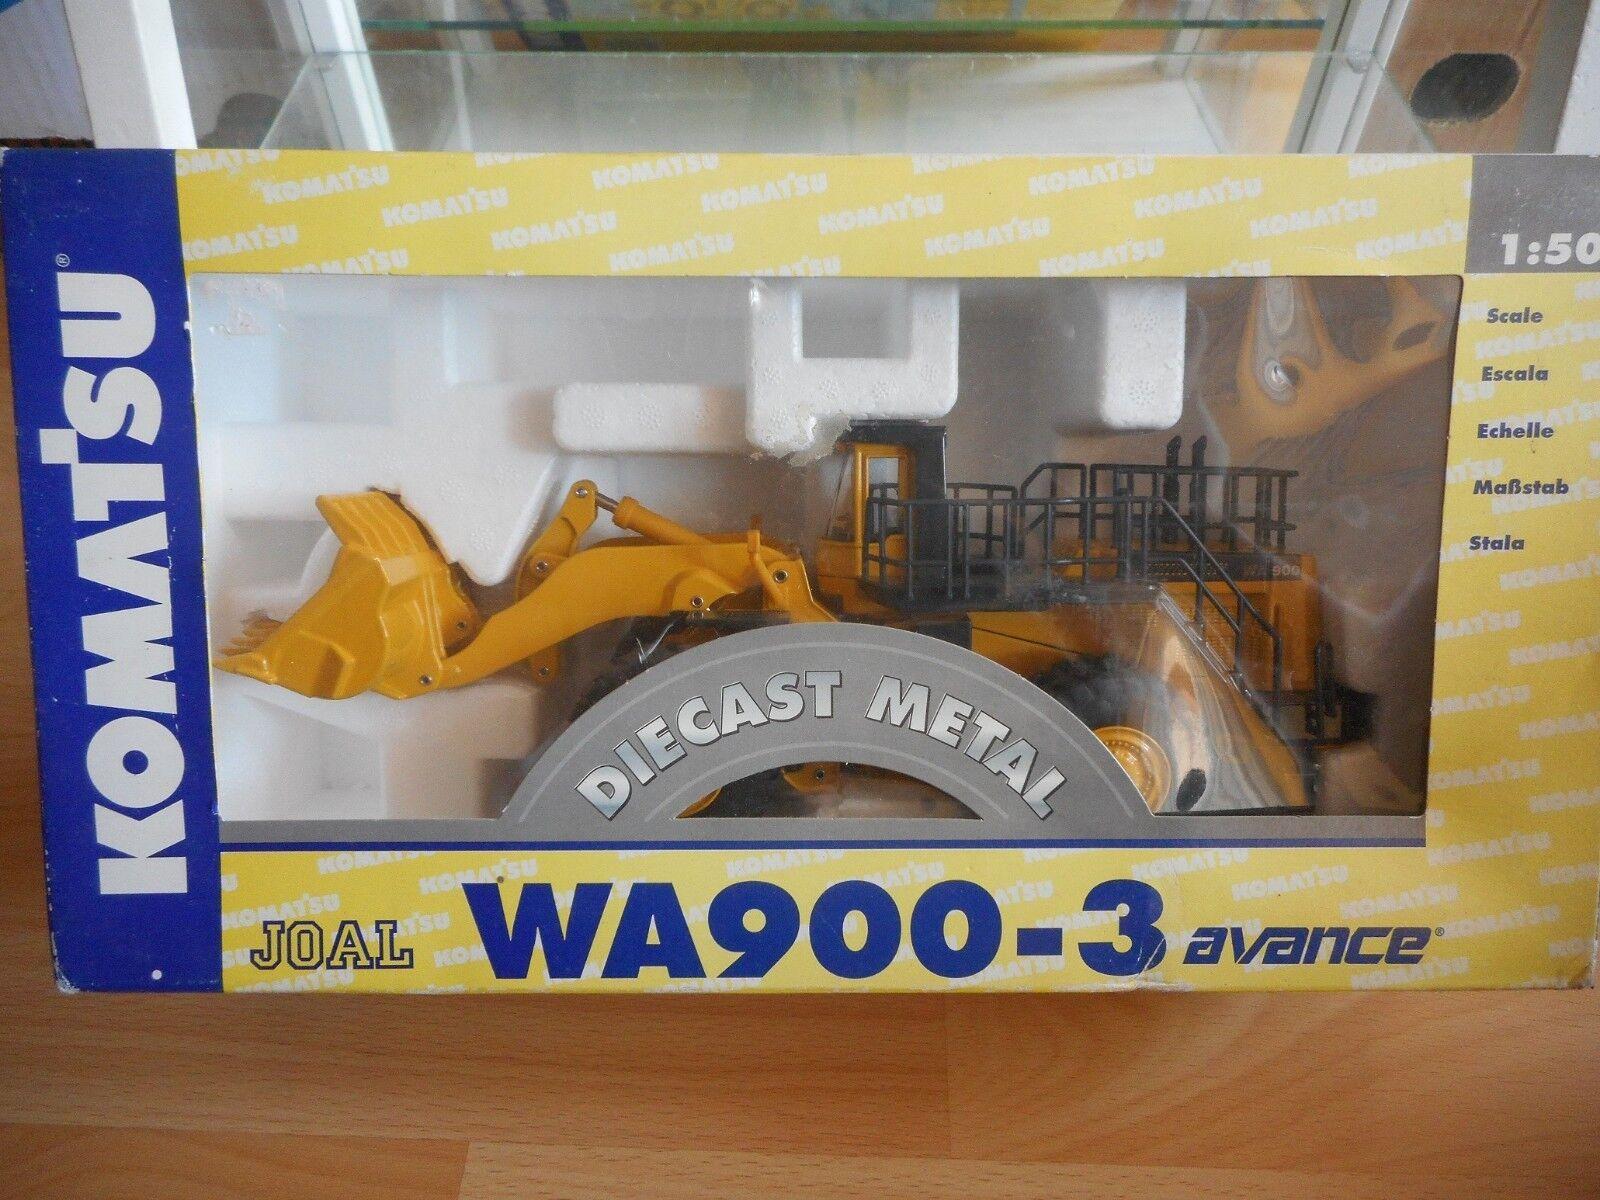 almacén al por mayor Joal Joal Joal Komatsu WA900-3 Avance Wheel Loader in amarillo on 1 50 in Box (Ref 265)  solo cómpralo